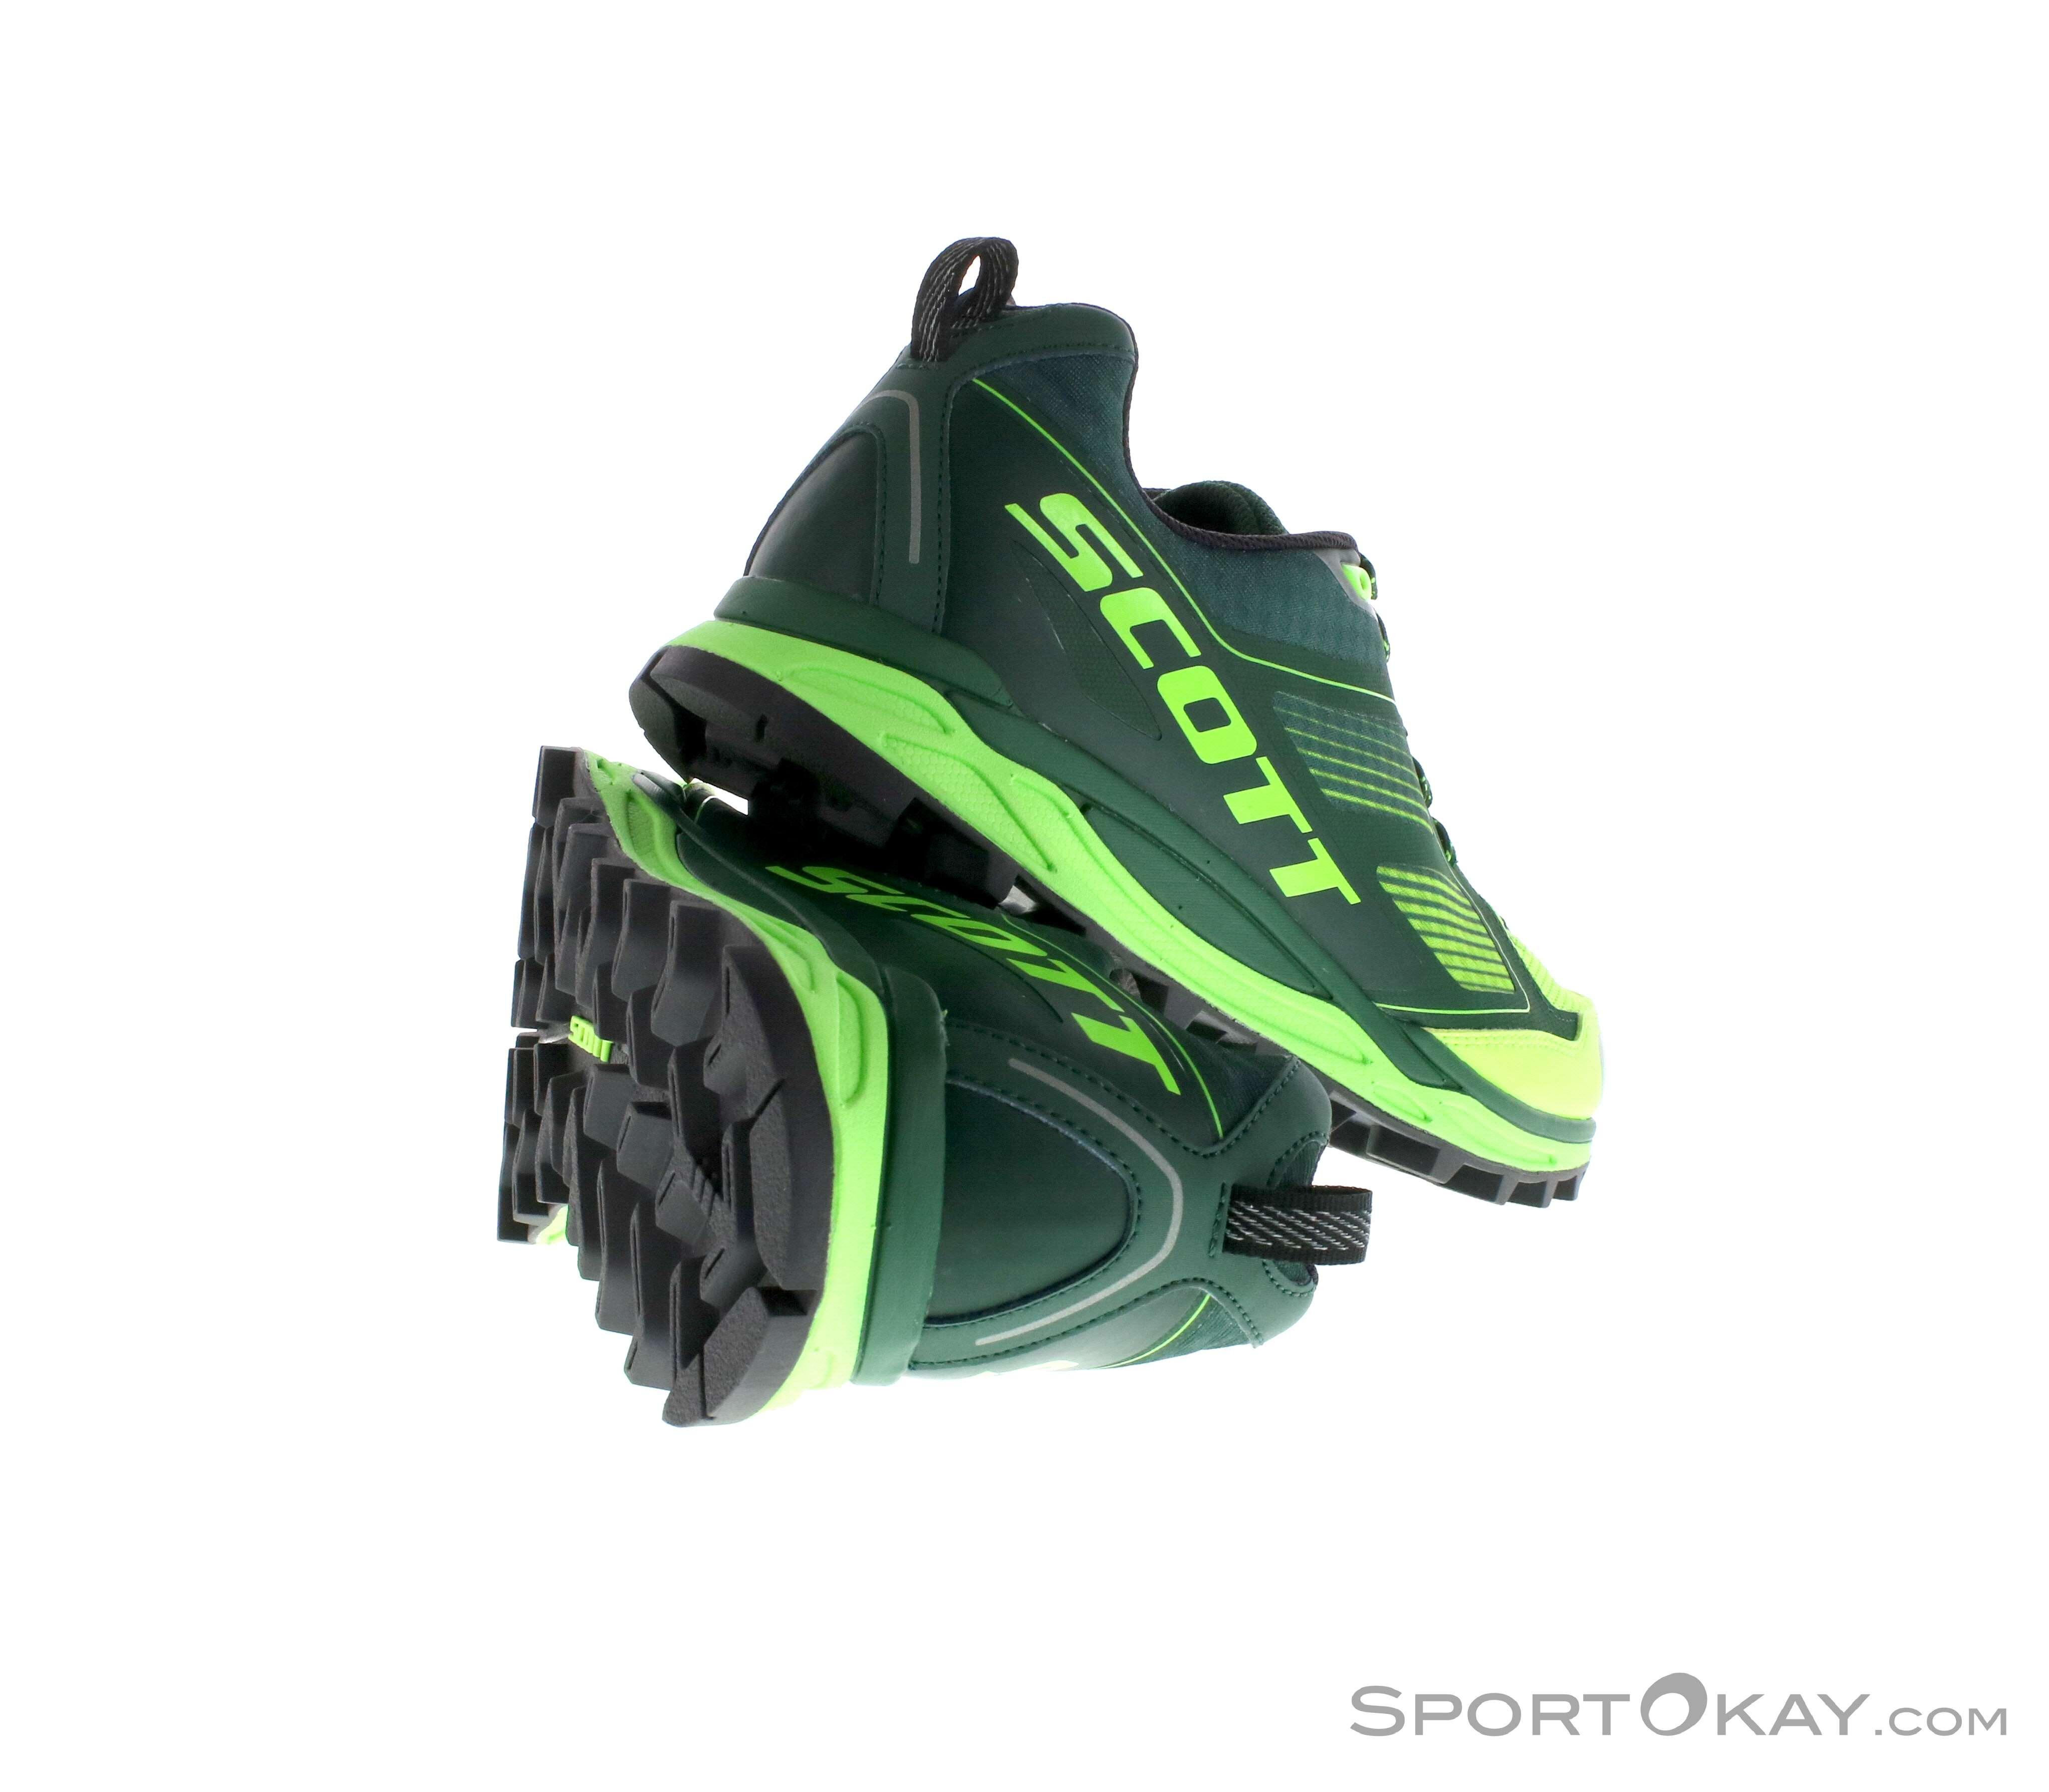 3e928d83e6253 Scott Kinabalu Supertrac Uomo Scarpe da Trail Running - Scarpe da ...